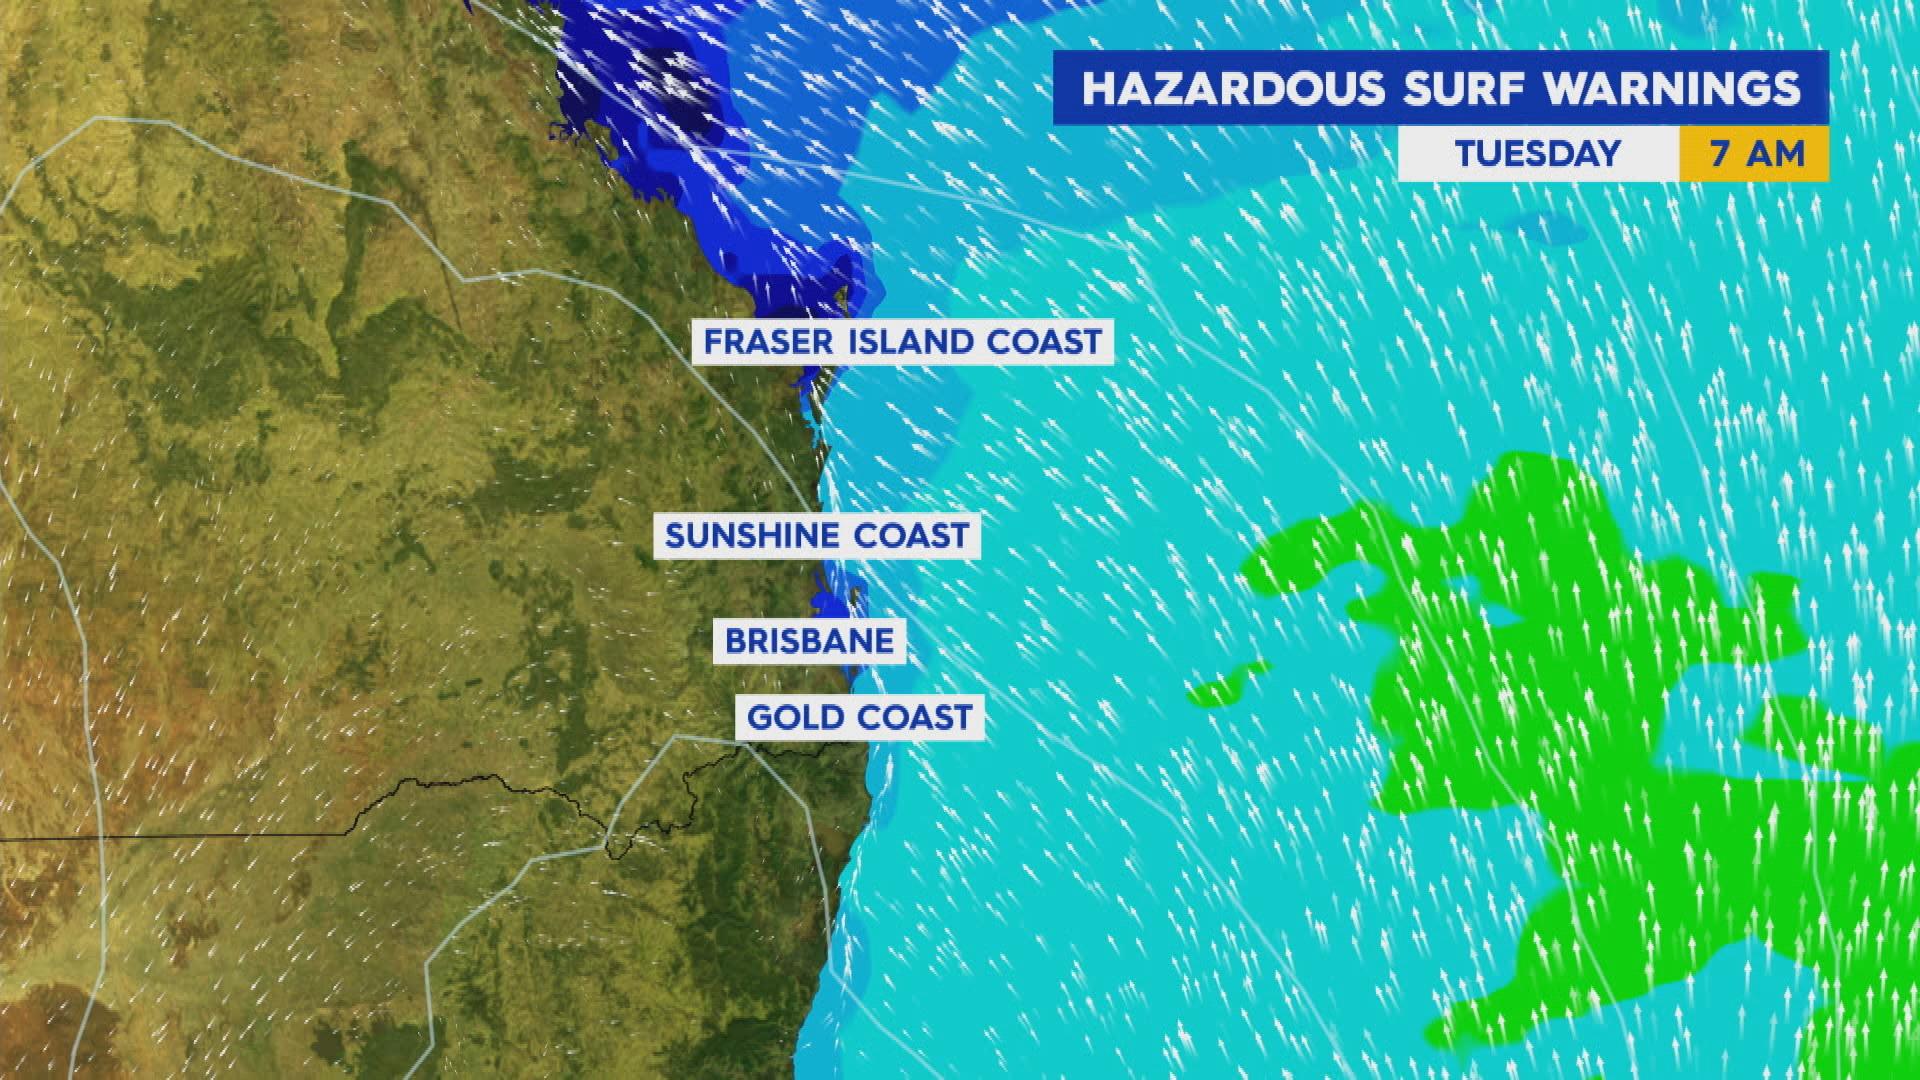 Hazardous surf conditions east coast